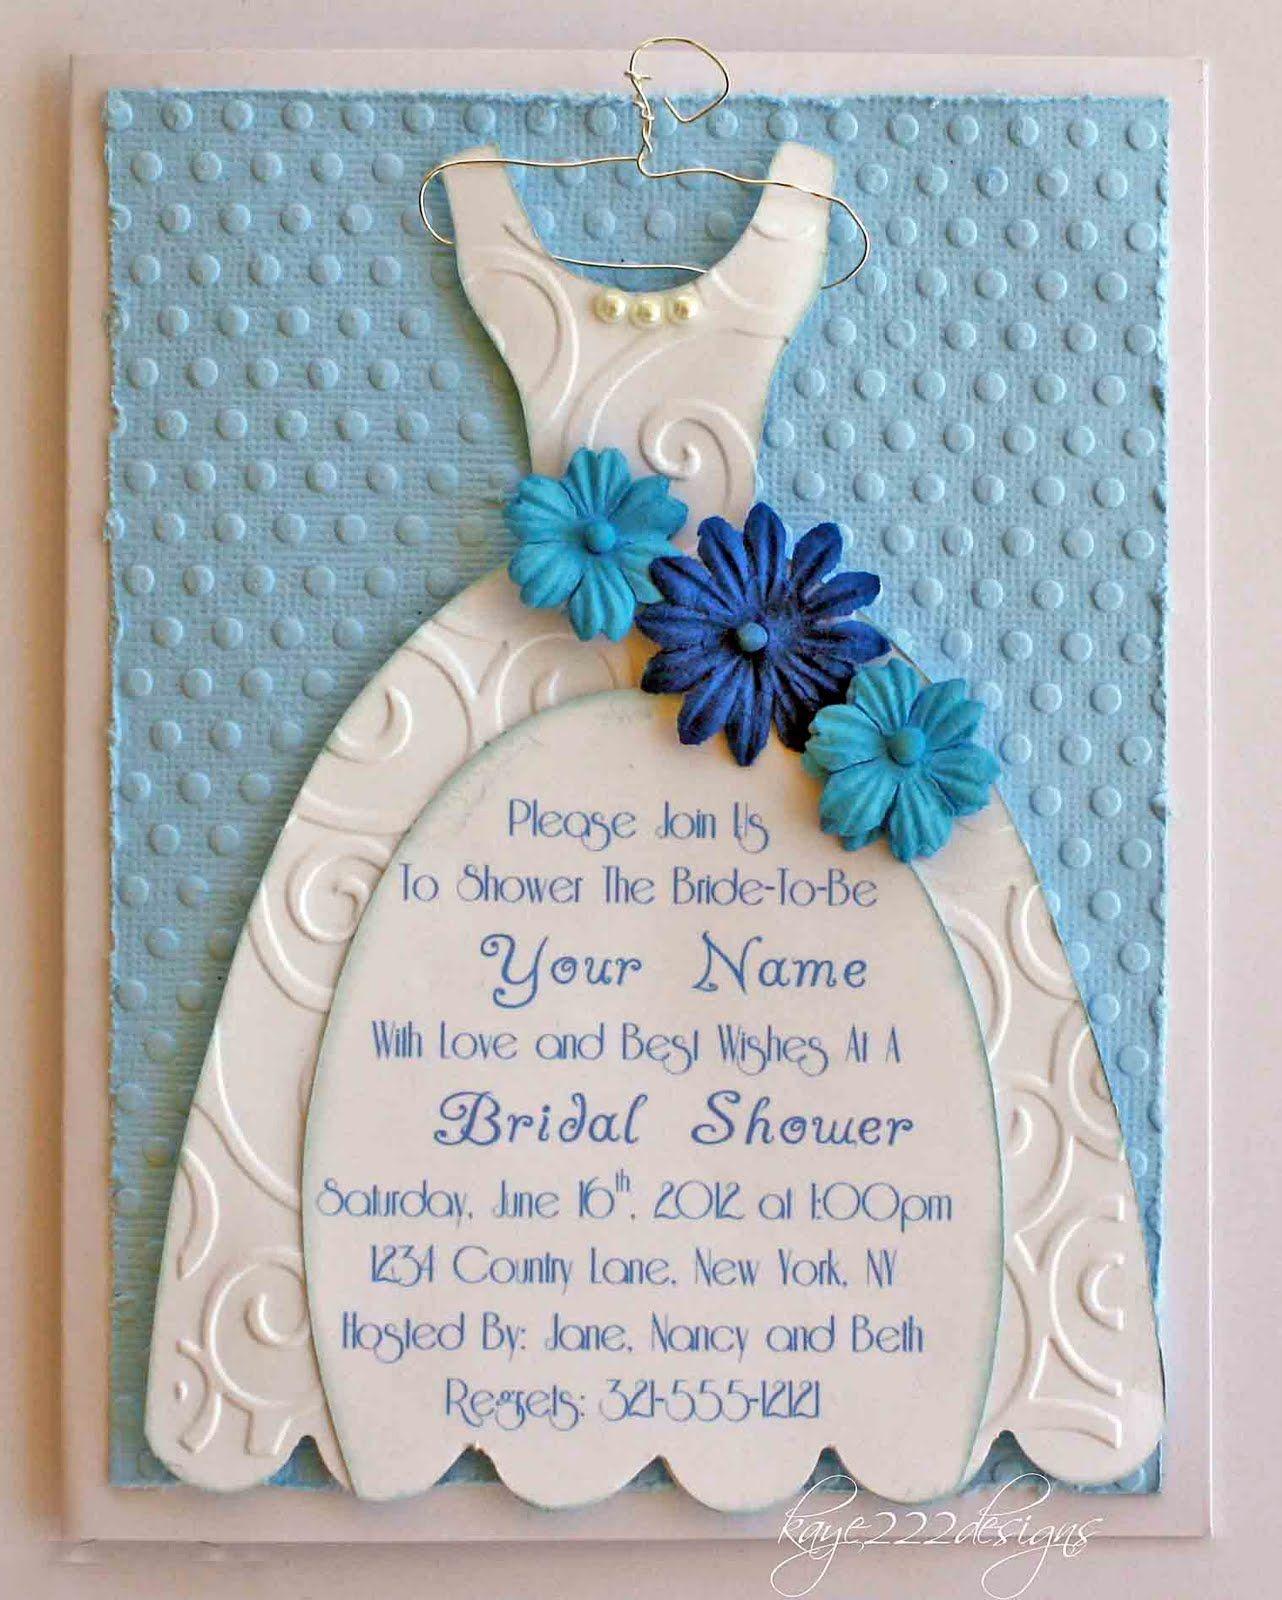 Cricut bridal shower invitation here is a closeup shot of the